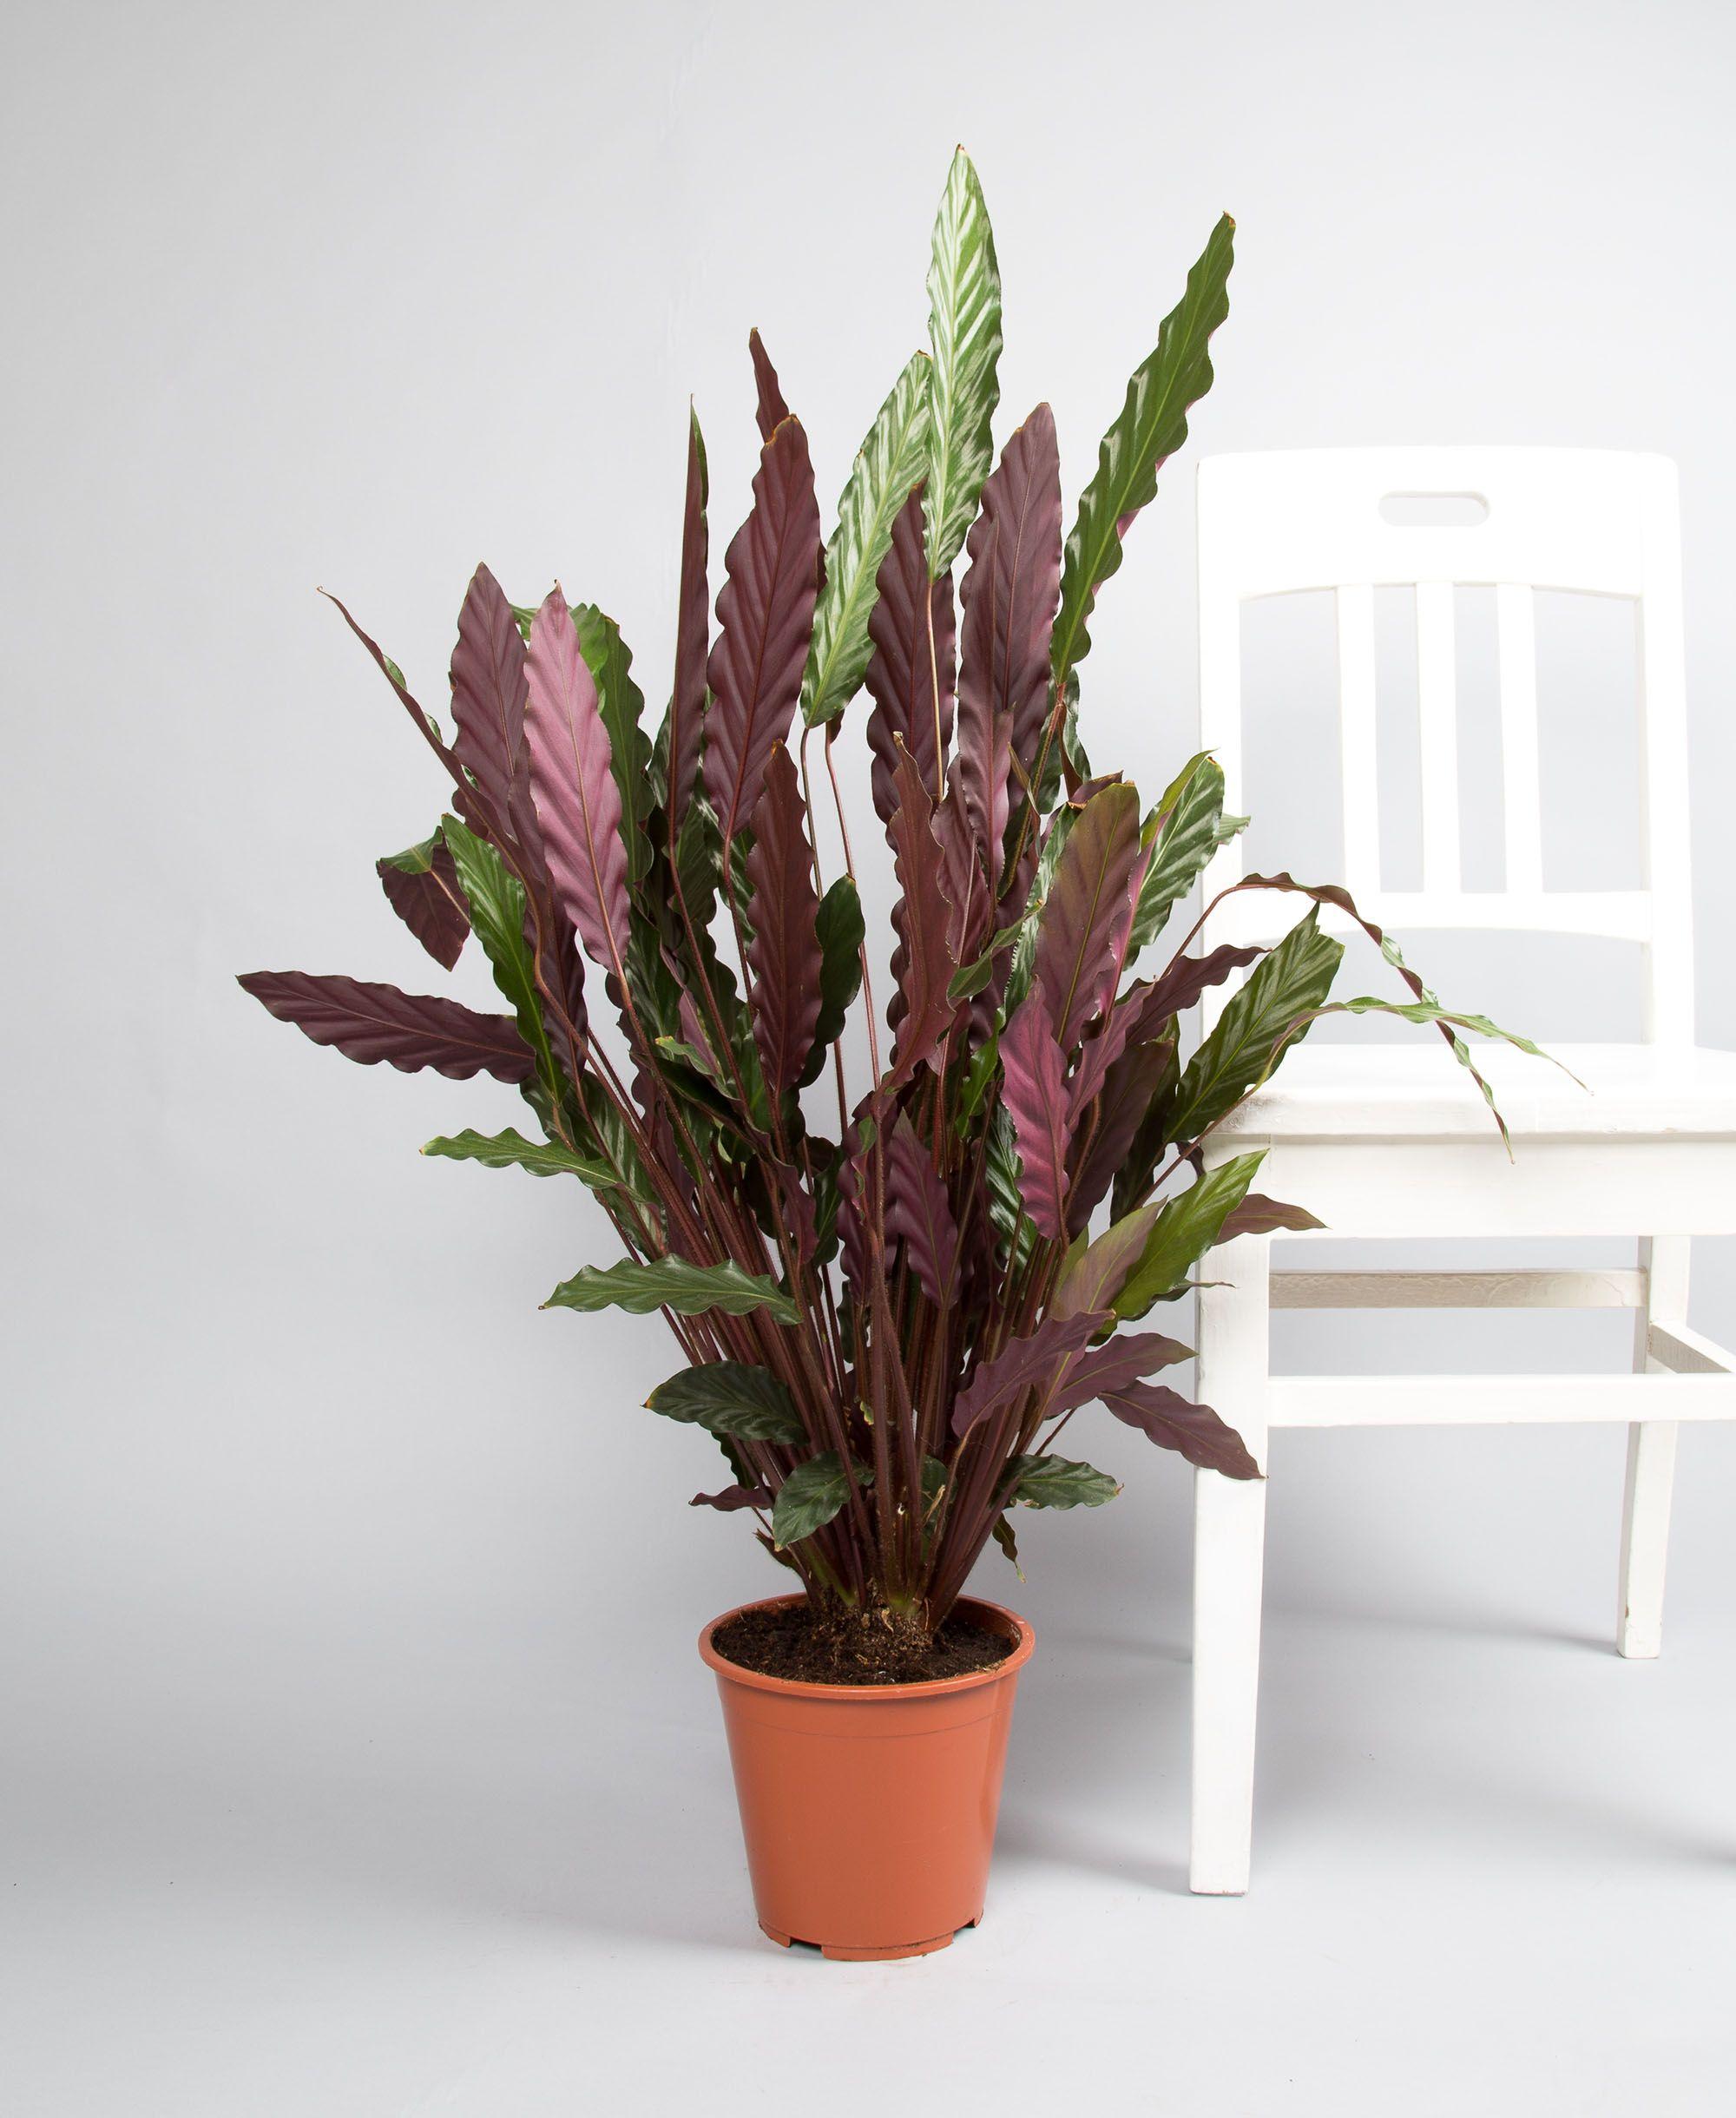 Grünpflanzen Green Plants Zimmerpflanzen: Calathea Rufibarba Fenzl 'Wavestar'